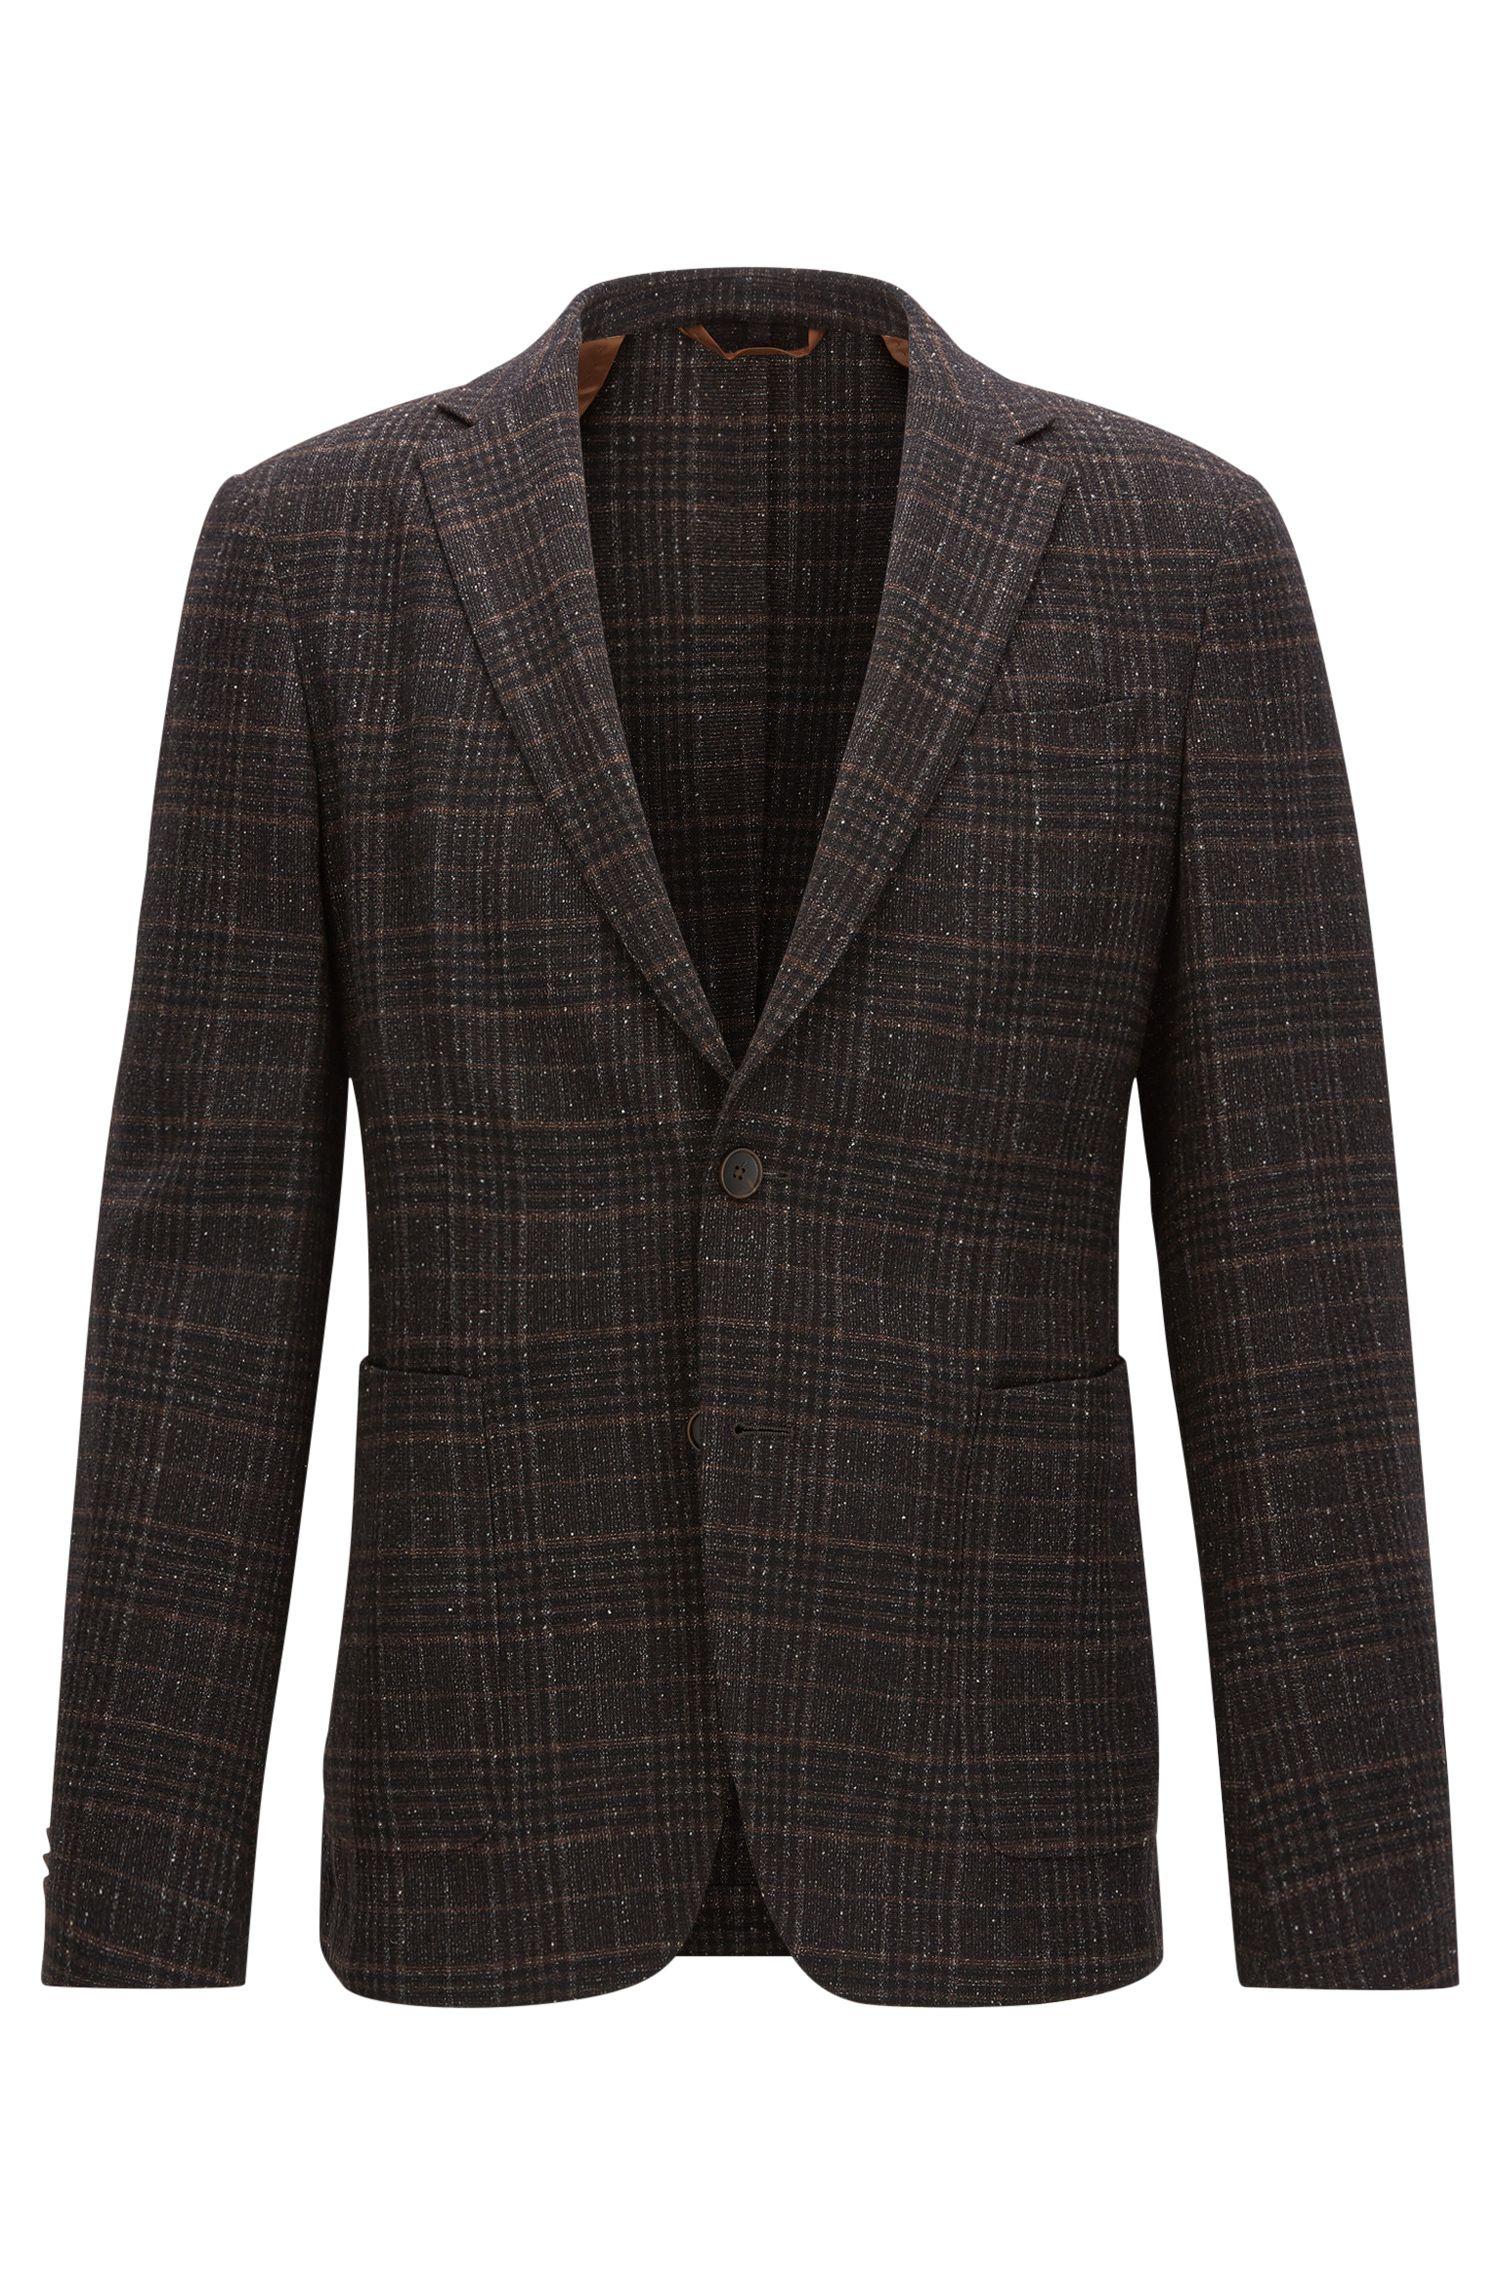 Plaid Wool Blend Sport Coat, Slim Fit | Nold